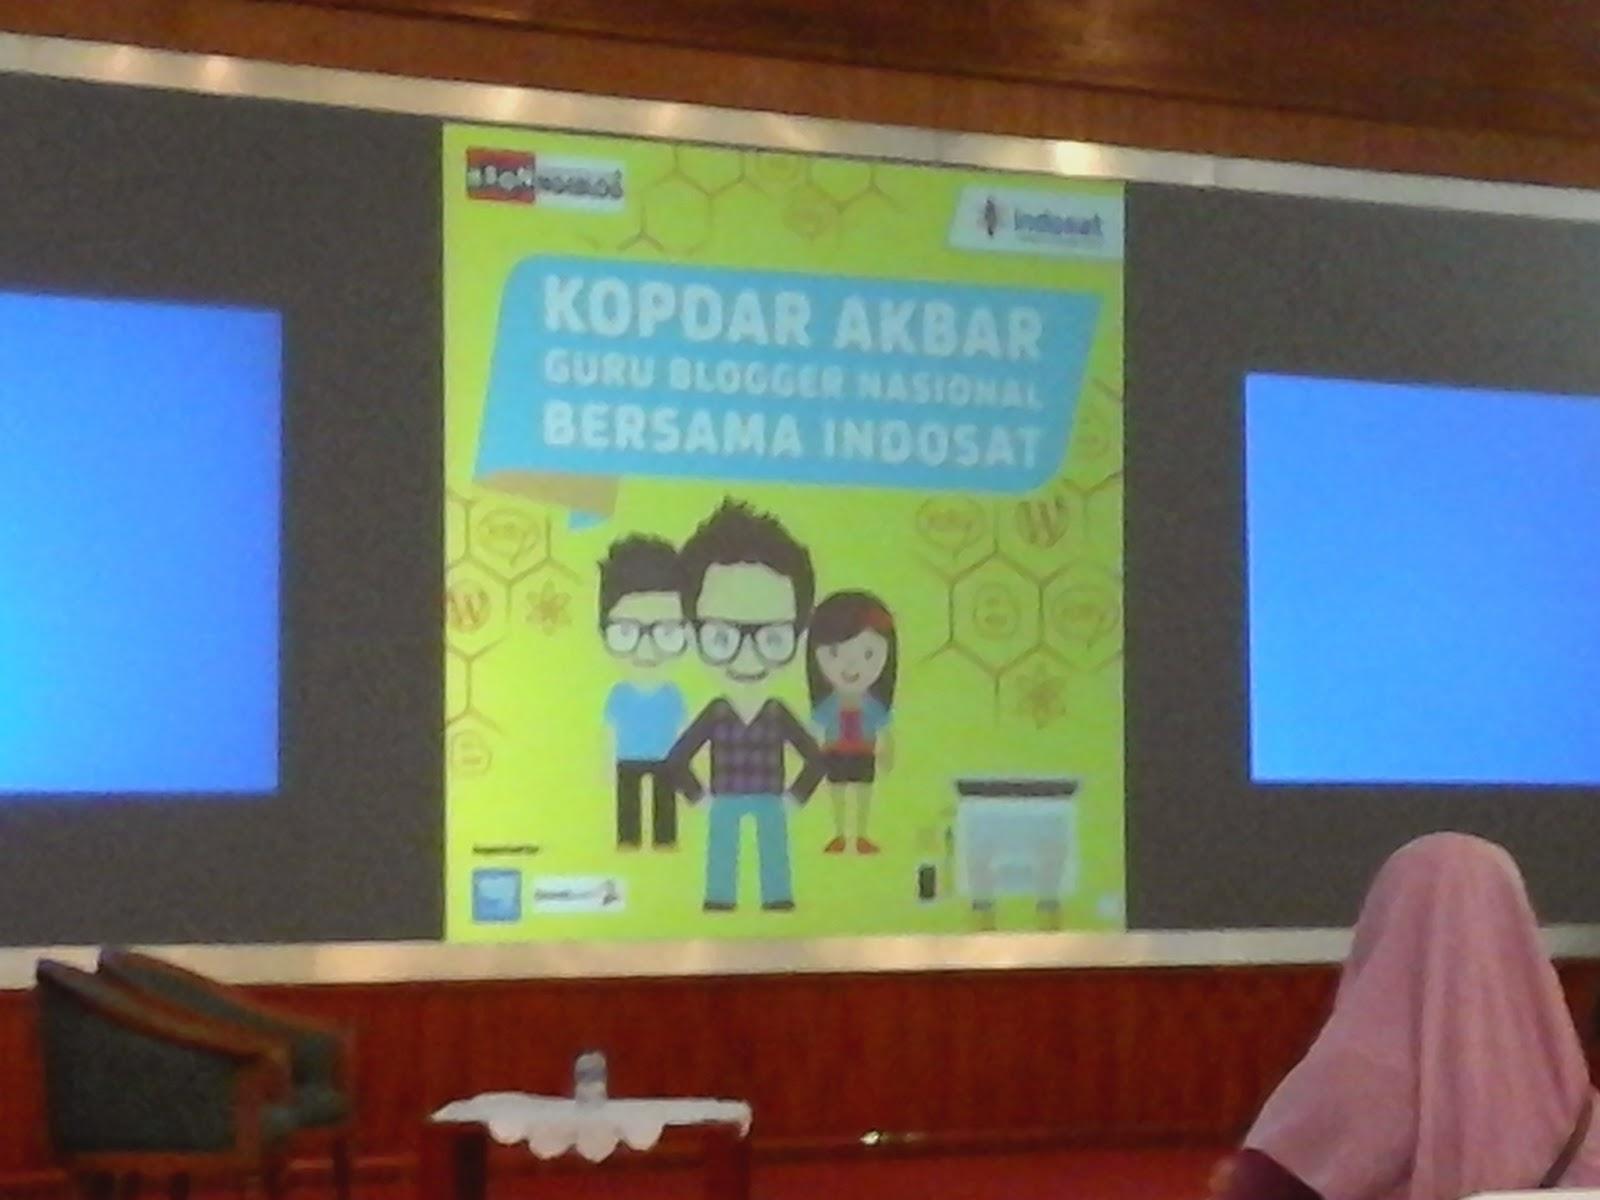 Kopdar Akbar Guru Blogger Indosat